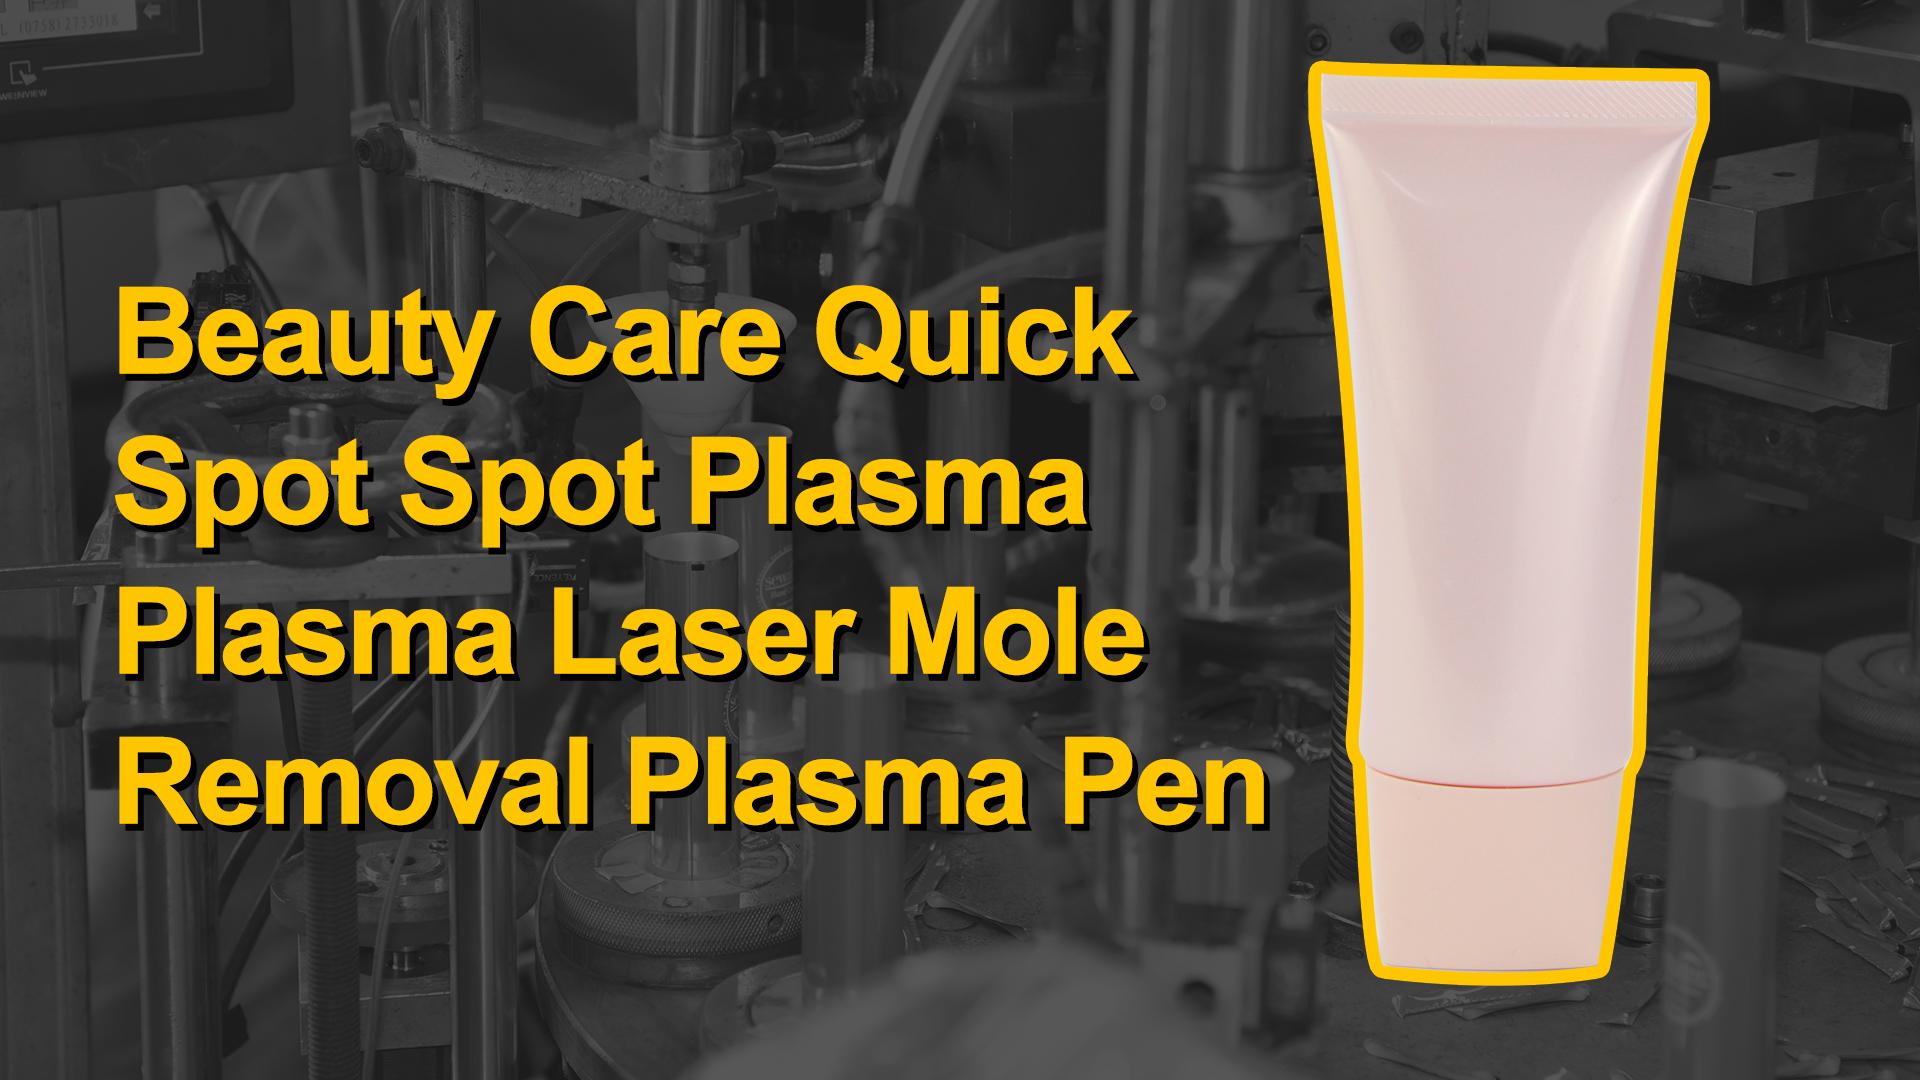 Skønhedspleje Hurtig spot Spot Plasma Plasma Laser Mole Removal Plasma Pen